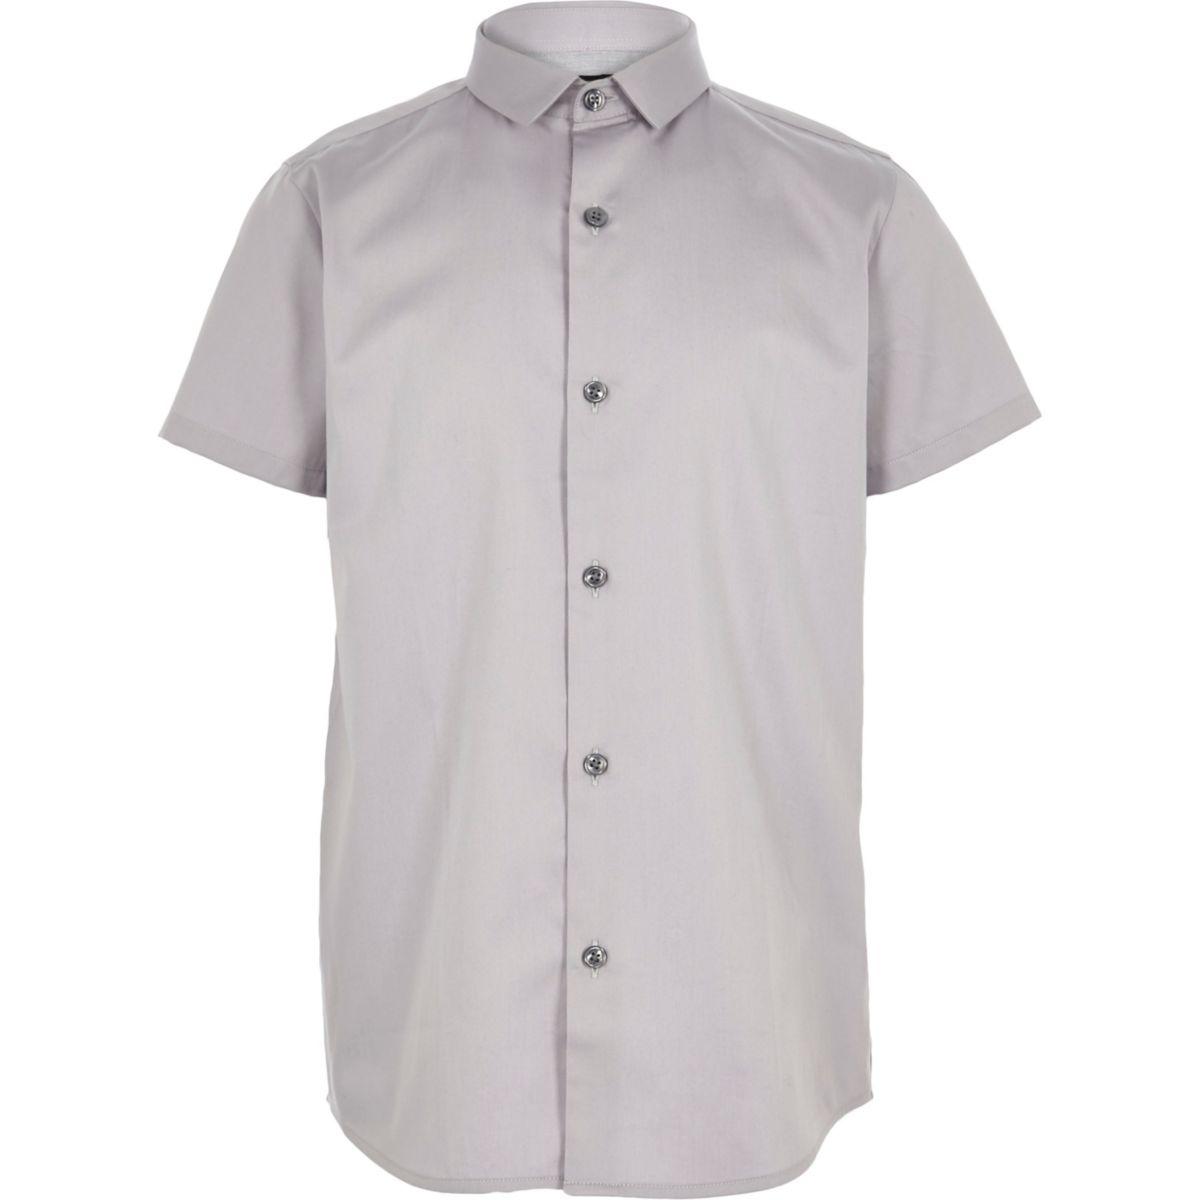 Boys grey short sleeve shirt